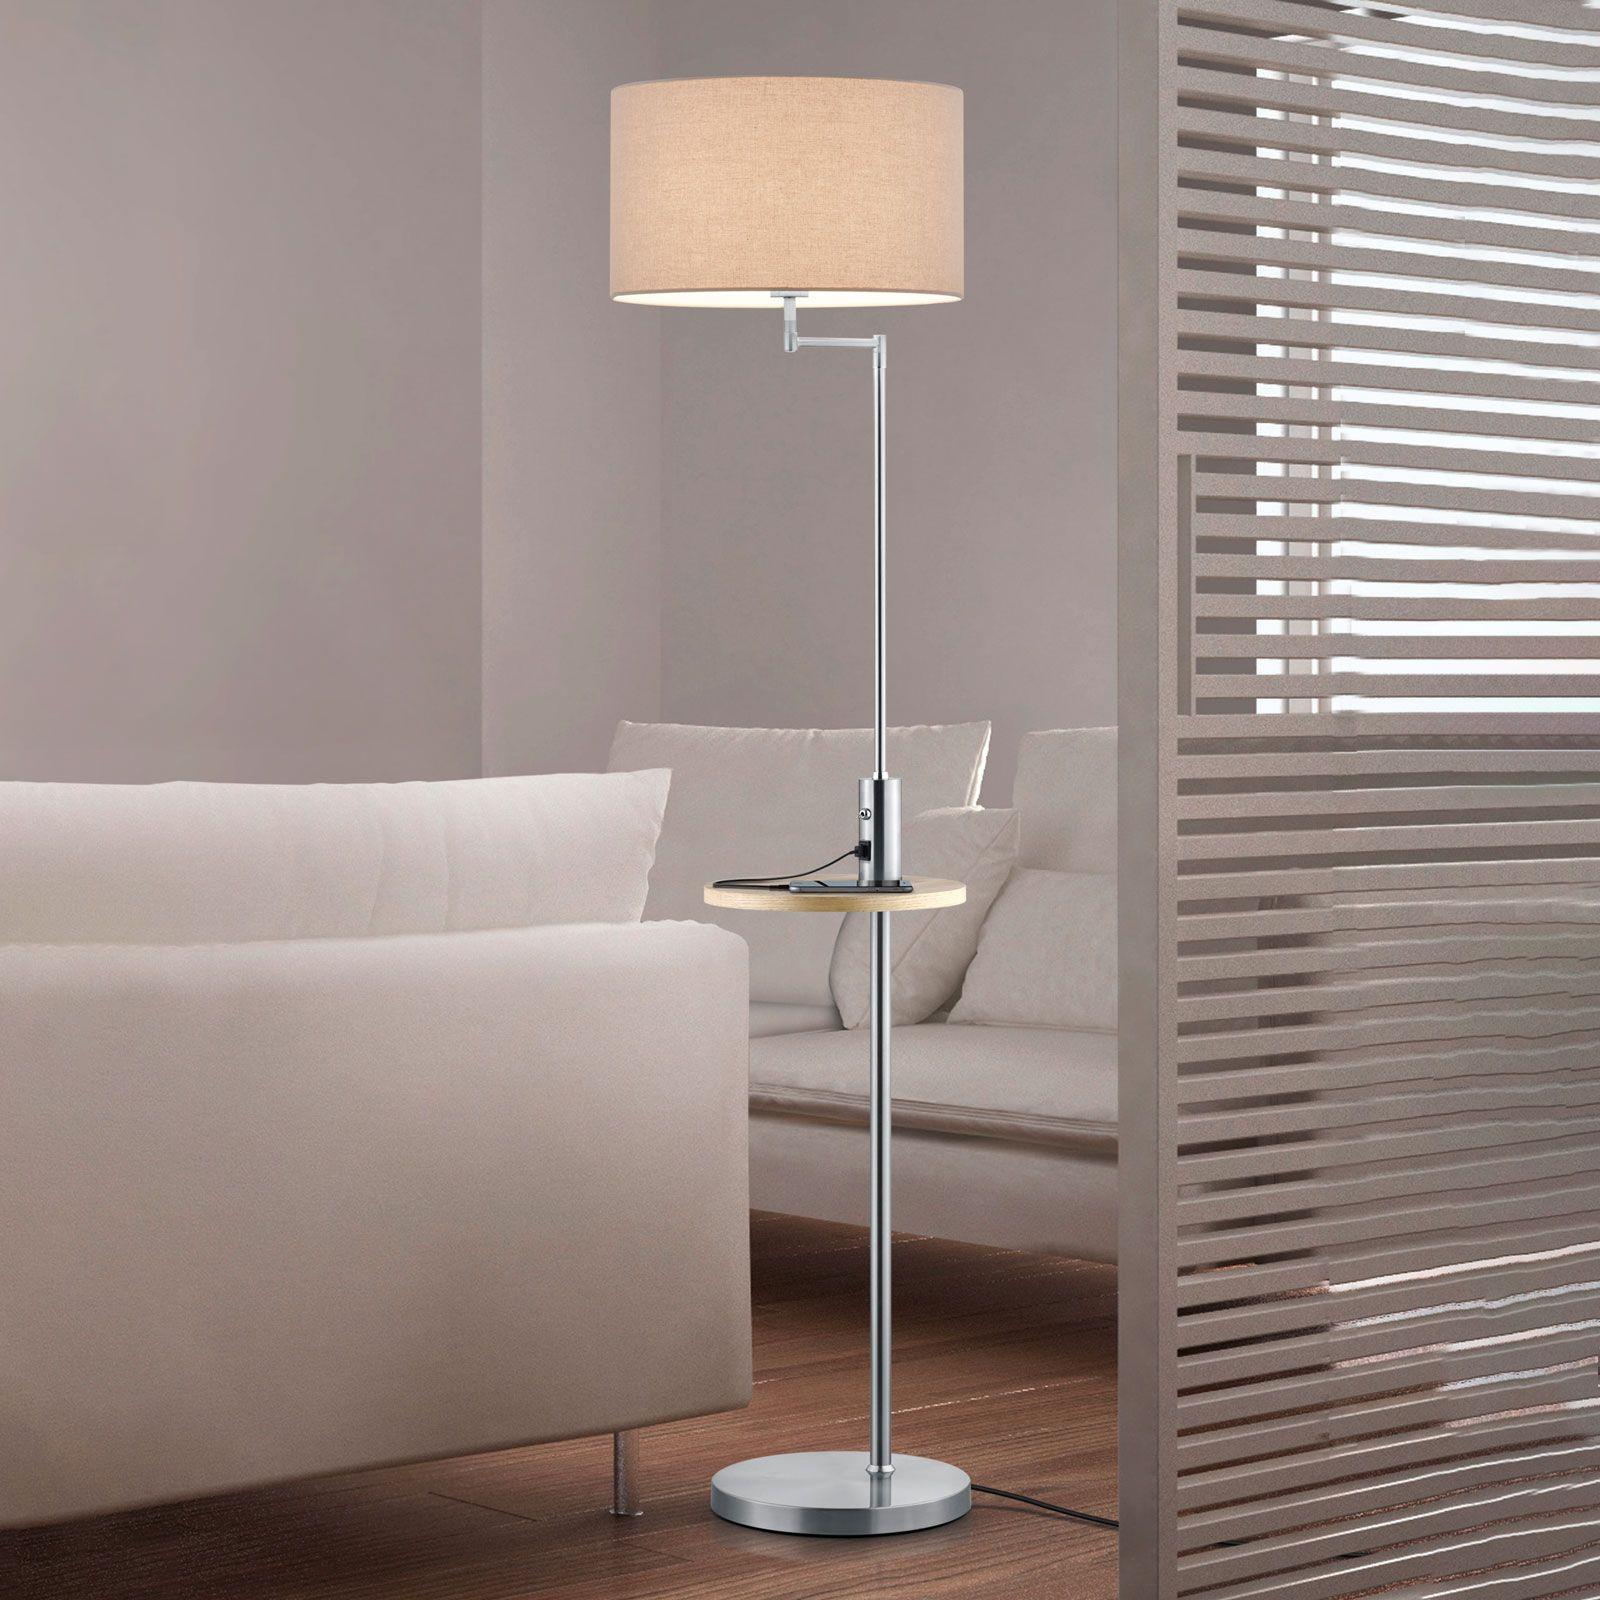 Vloerlamp Claas, legbord, USB-poort, nikkel